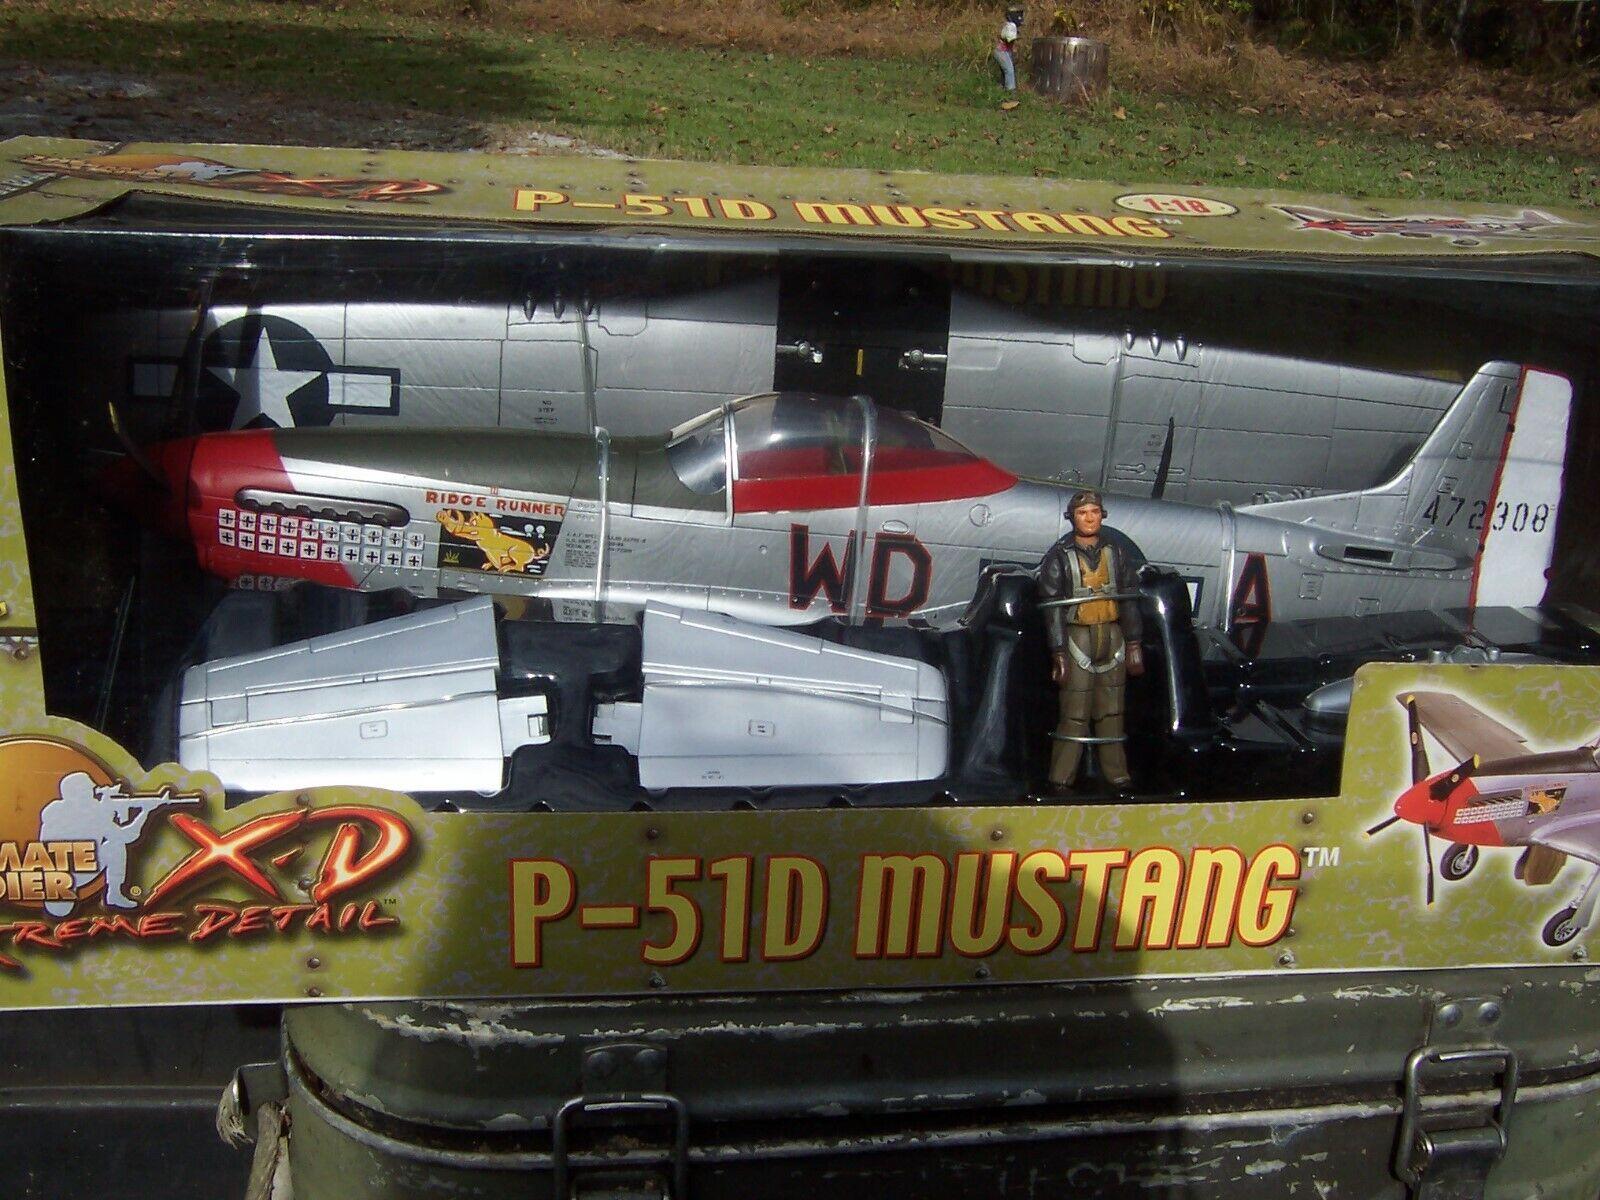 ultimate soldier XD P-51D Mustang 1:18 Ridge Runner